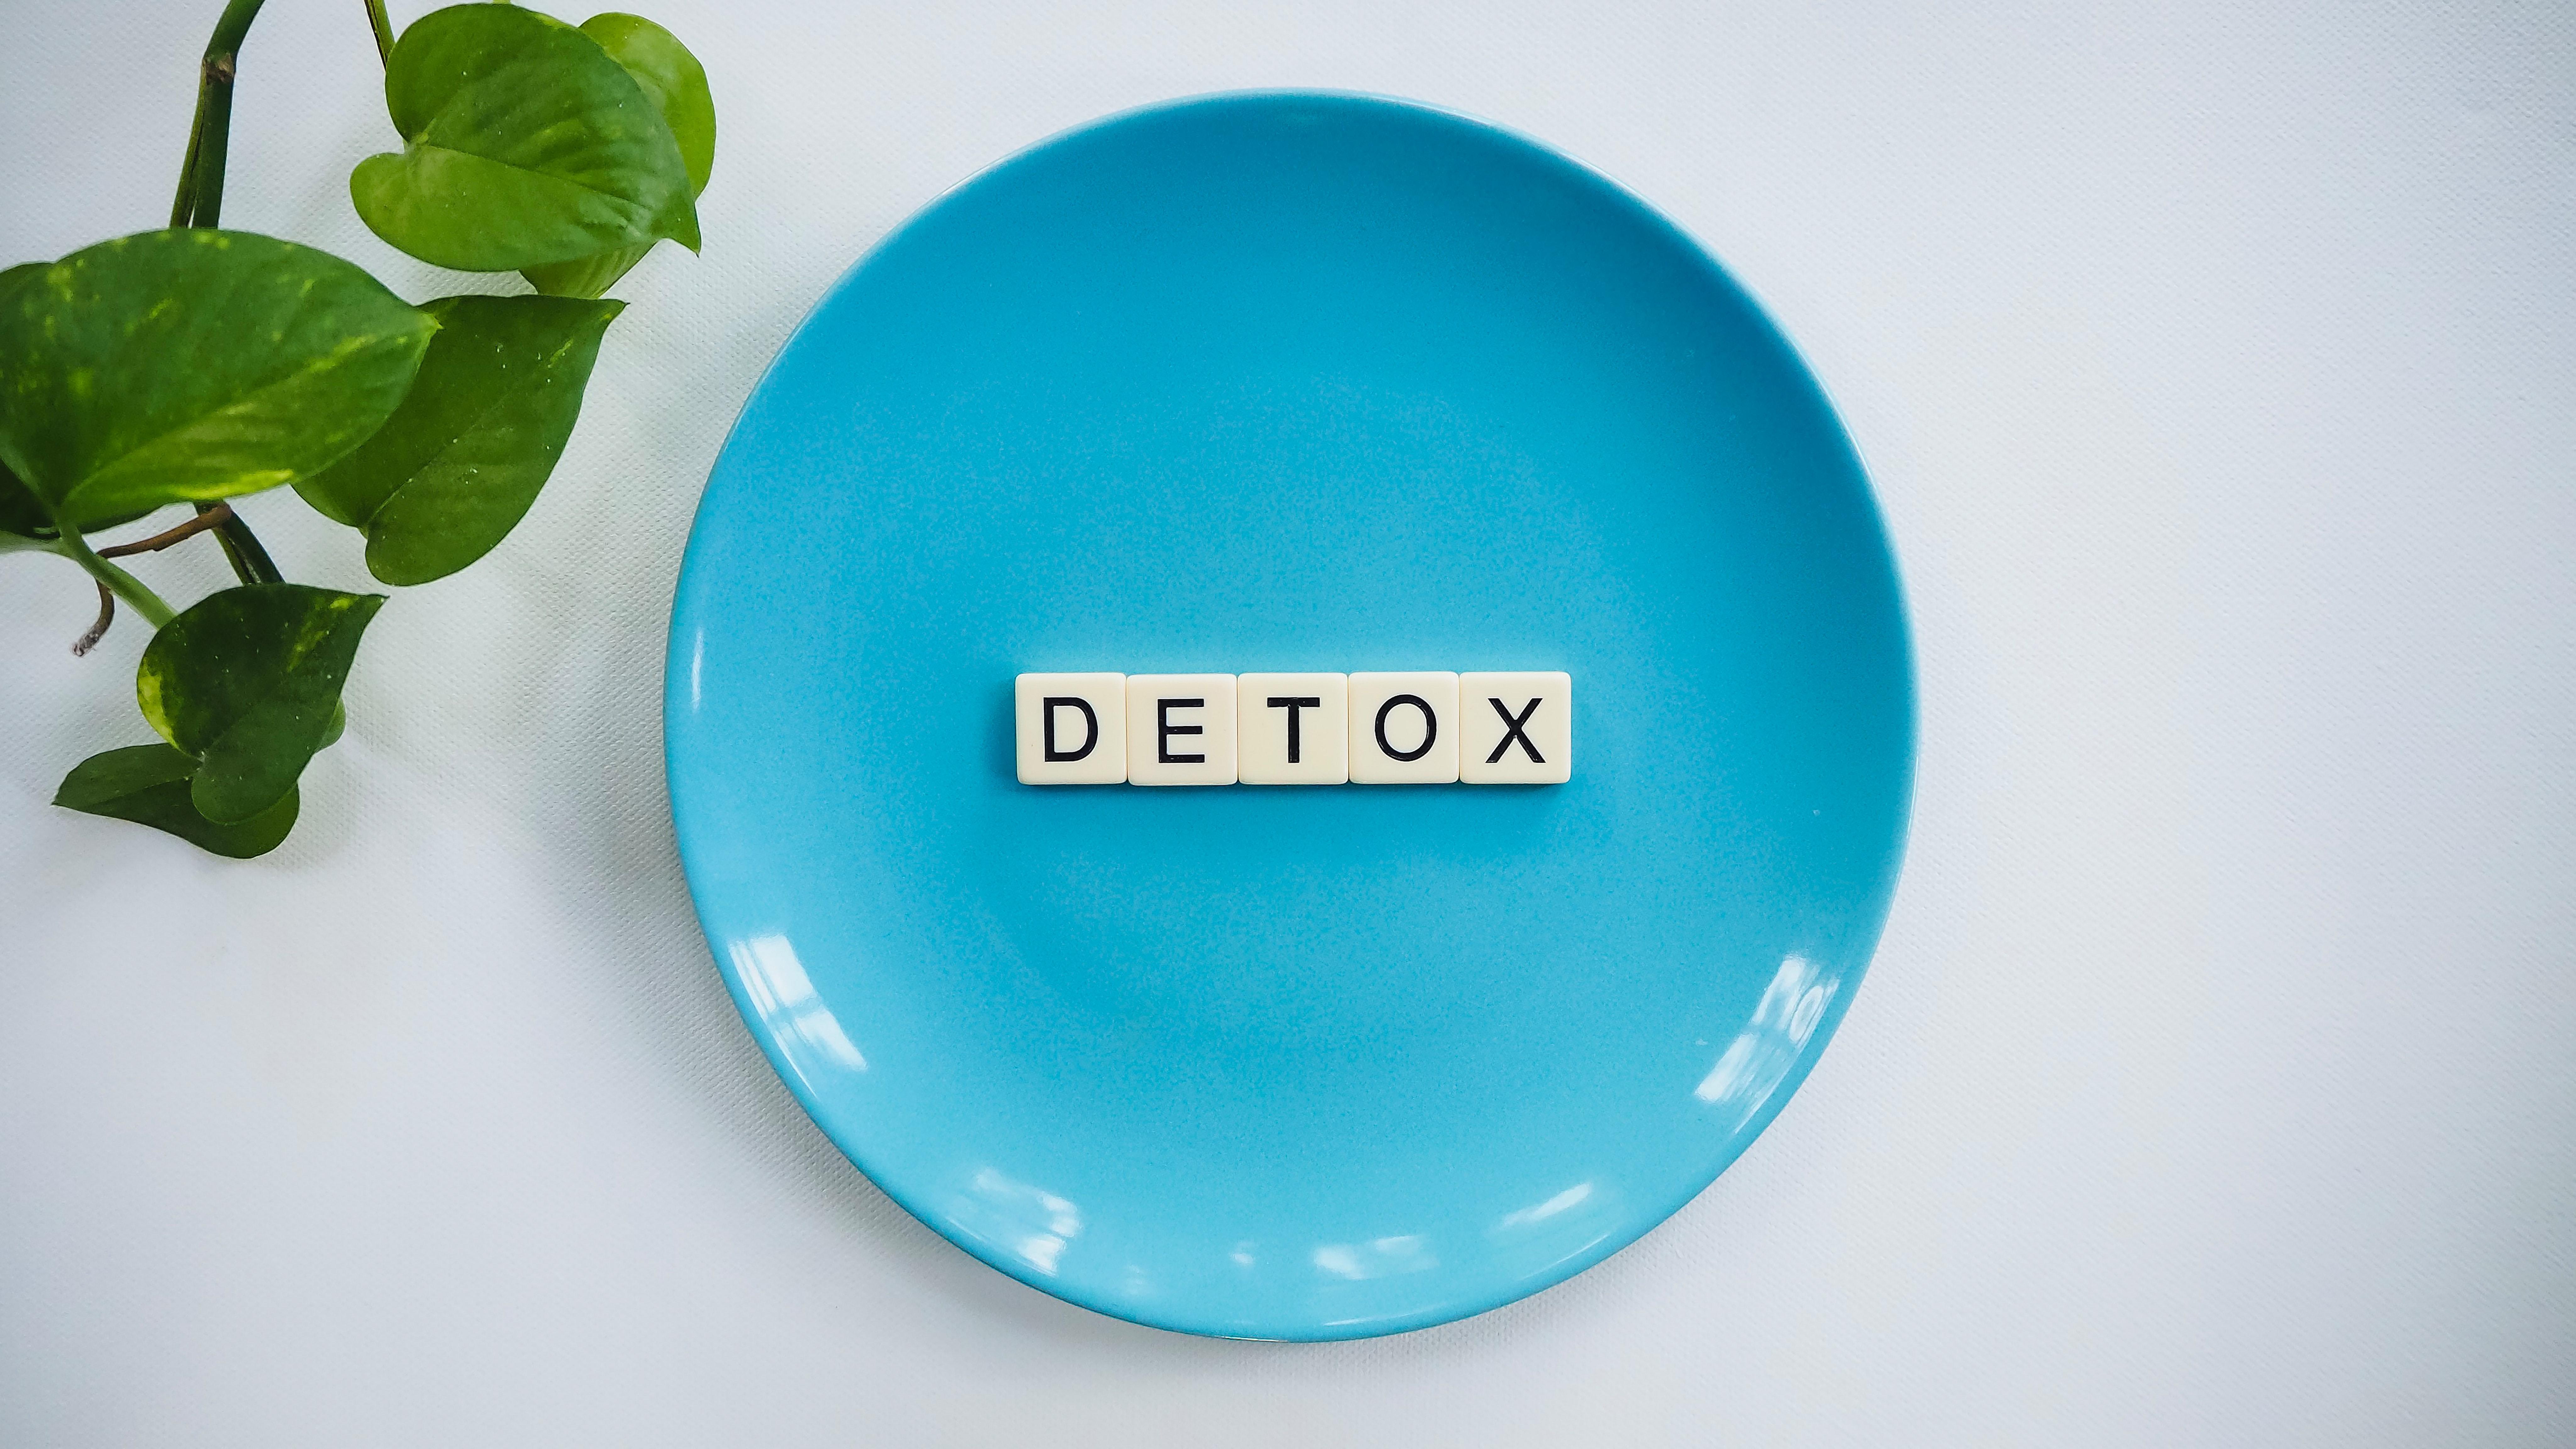 detox-text-on-round-blue-plate-2377166.jpg